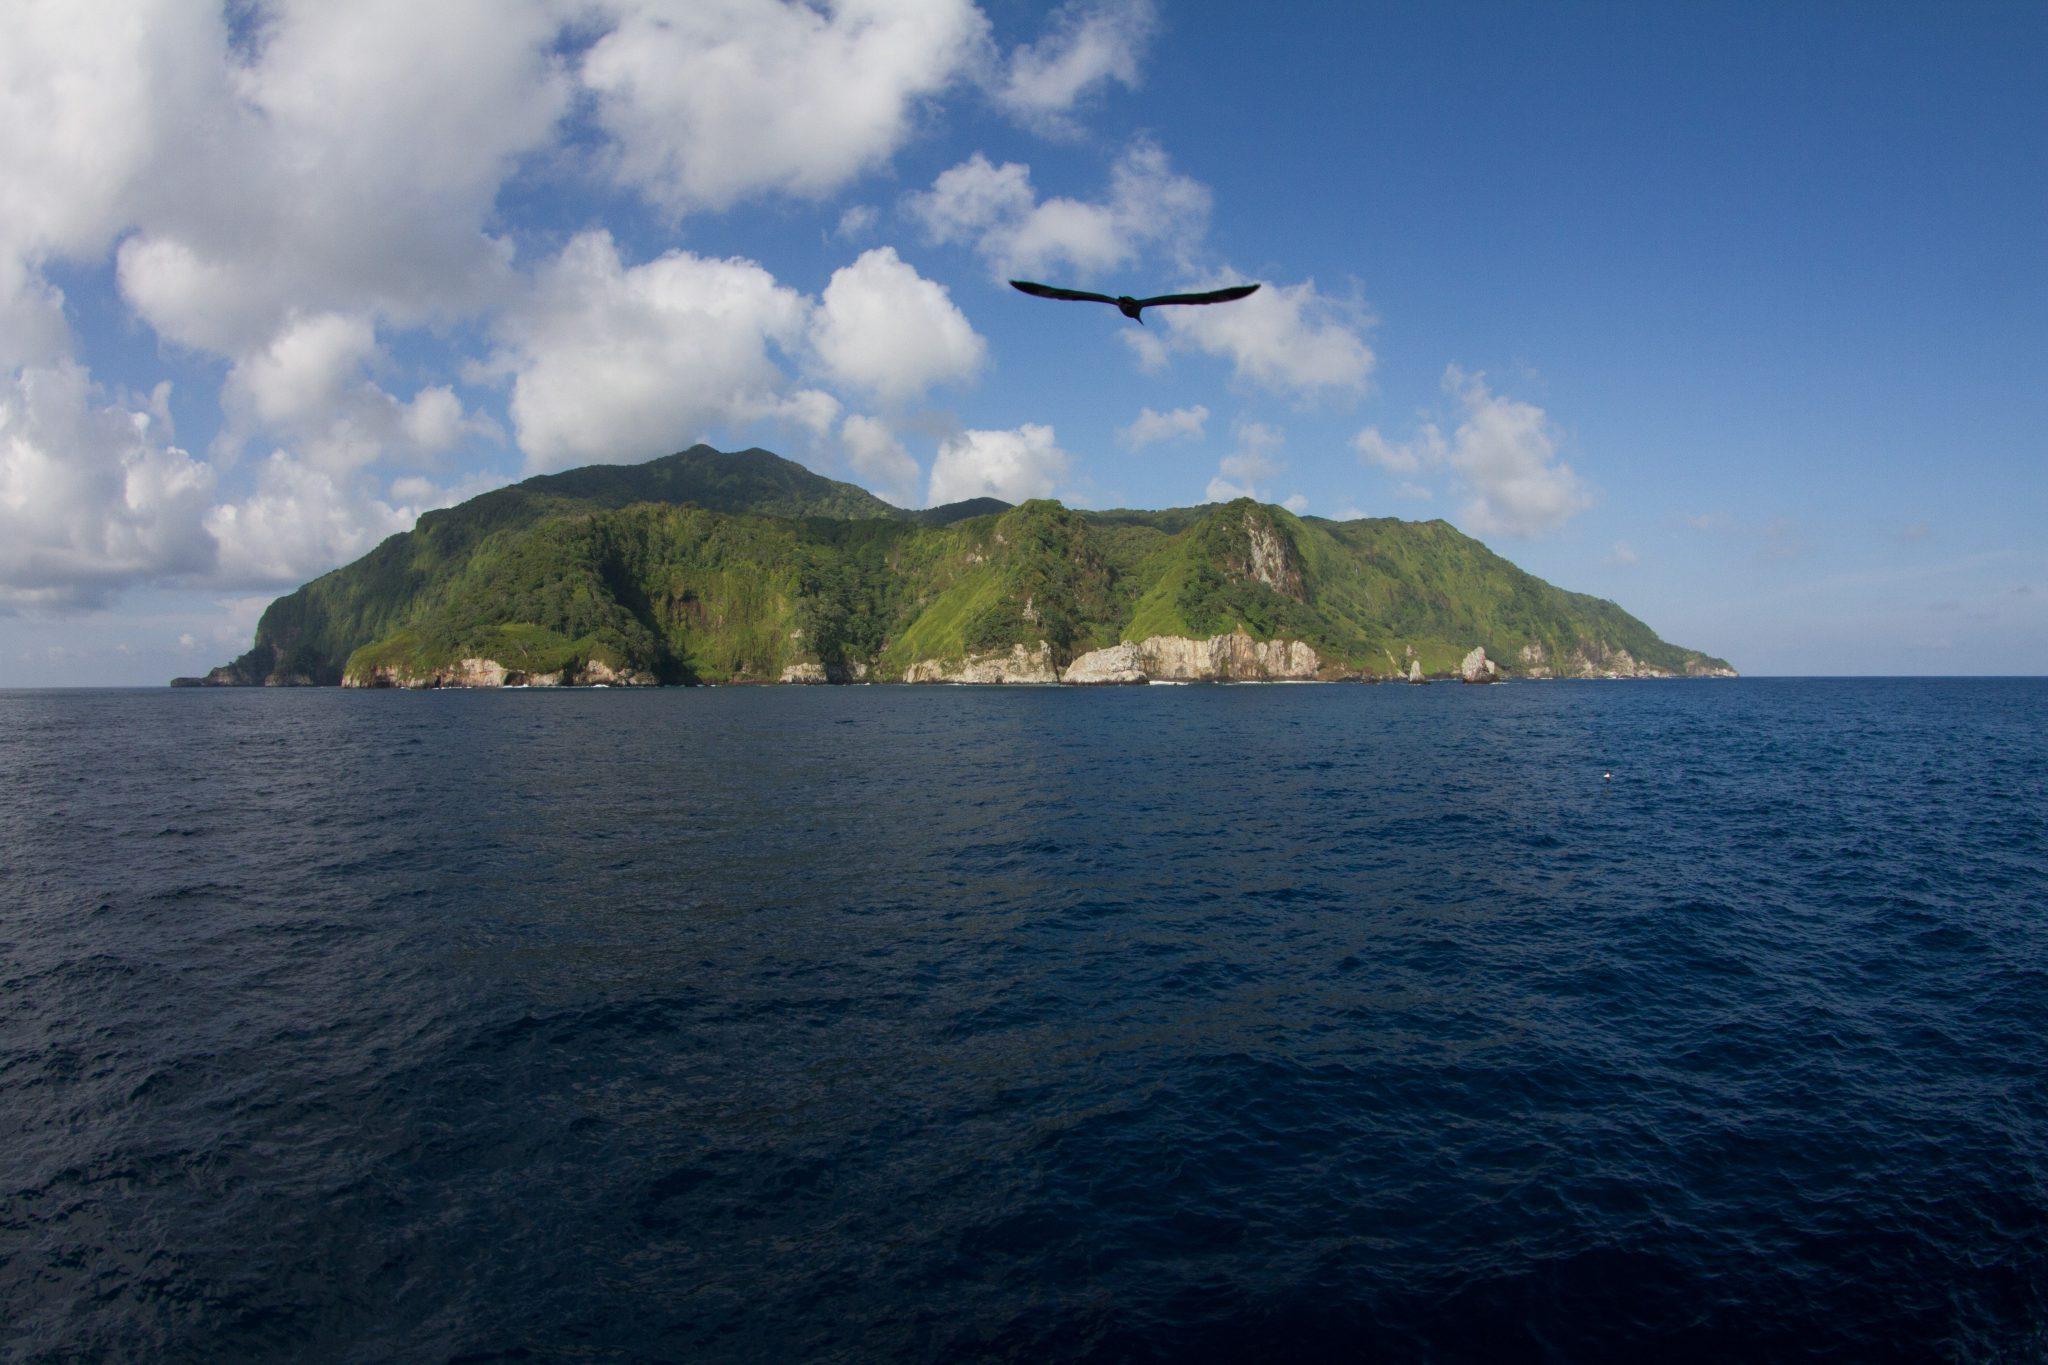 Undersea Hunter Group 2149 - Underseahunter Group